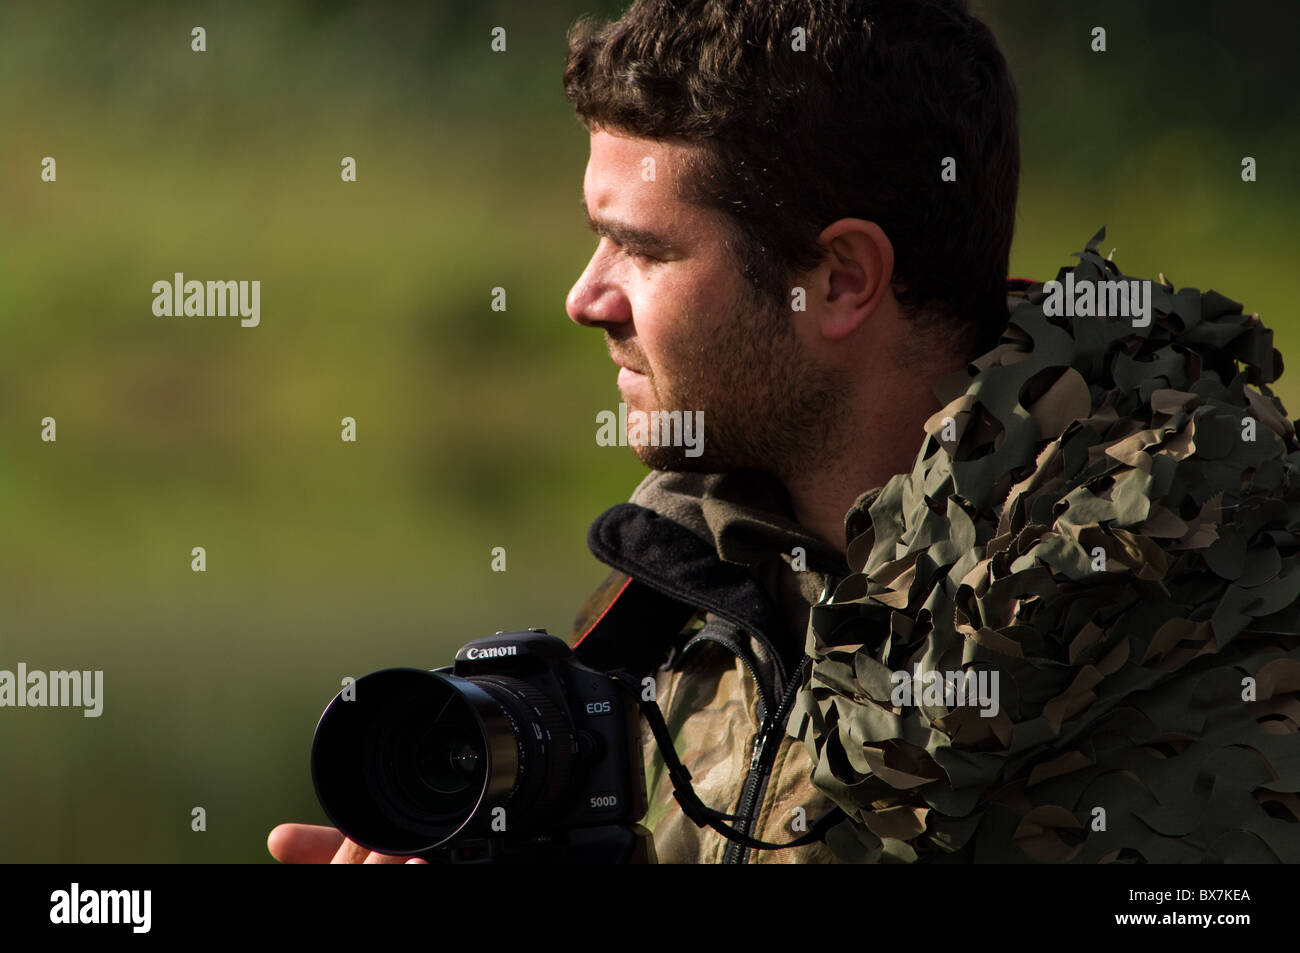 canon birdwatcher wildlife photographer - Stock Image